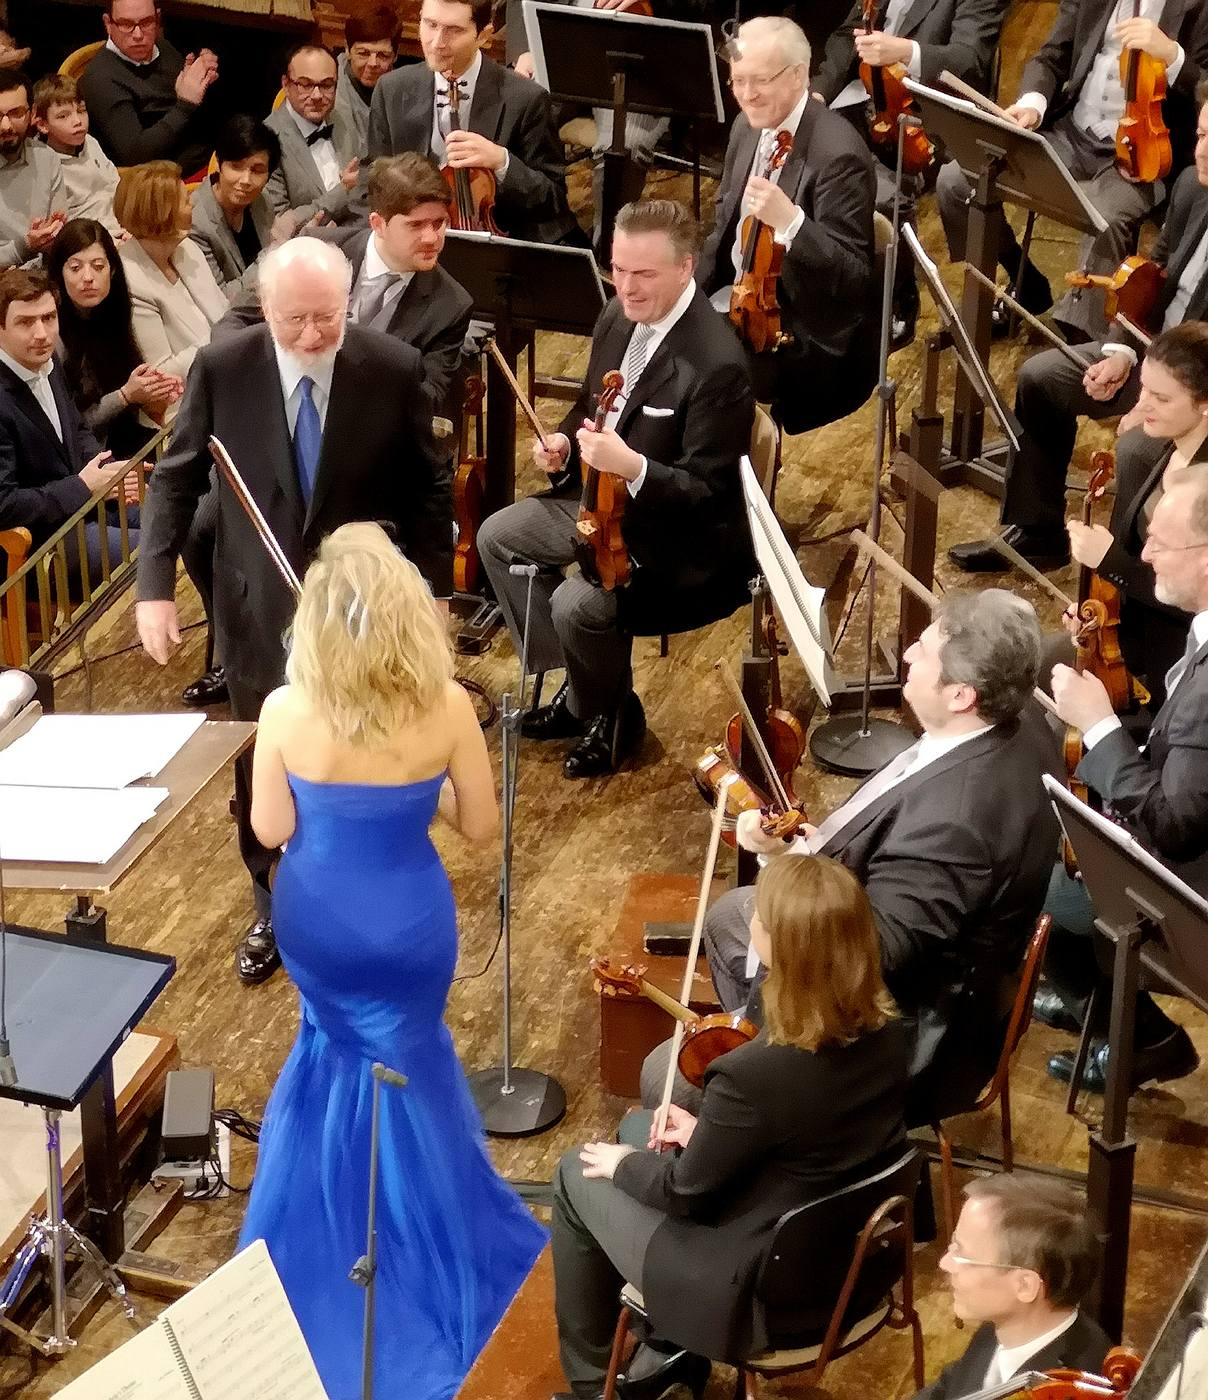 JohnWilliams-Vienna2020-ConcertSummary-G